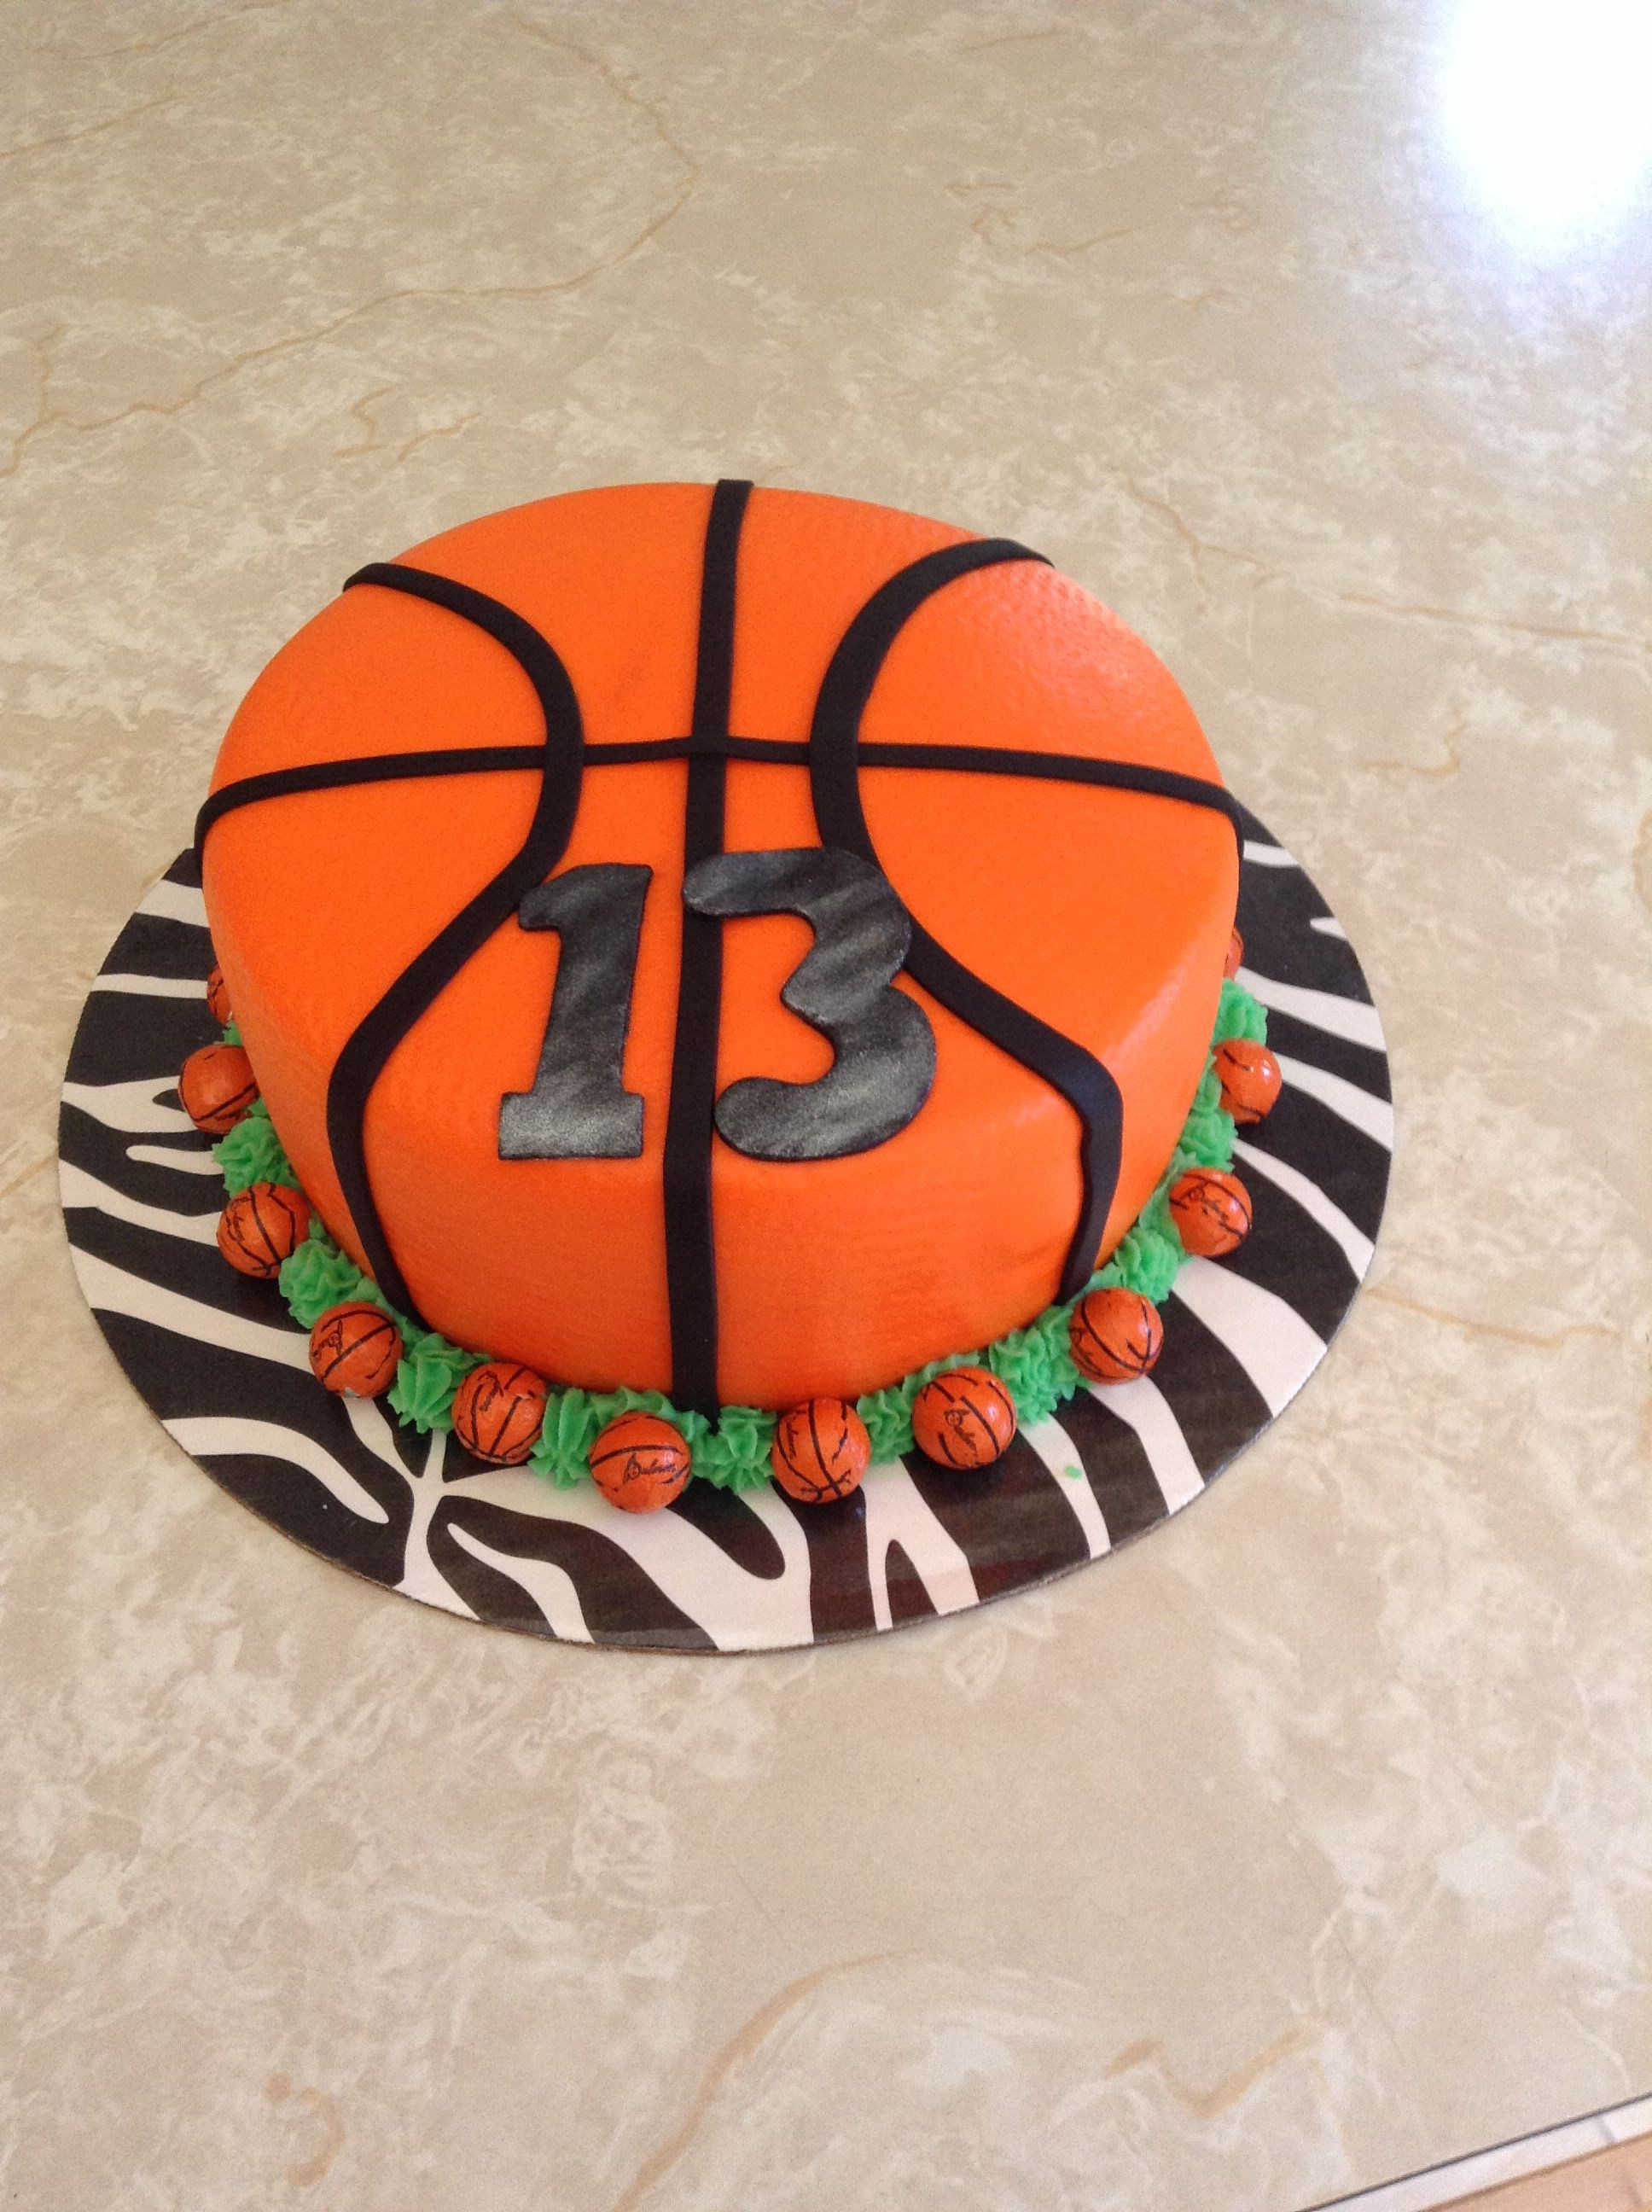 Basketball Cake For A Girl